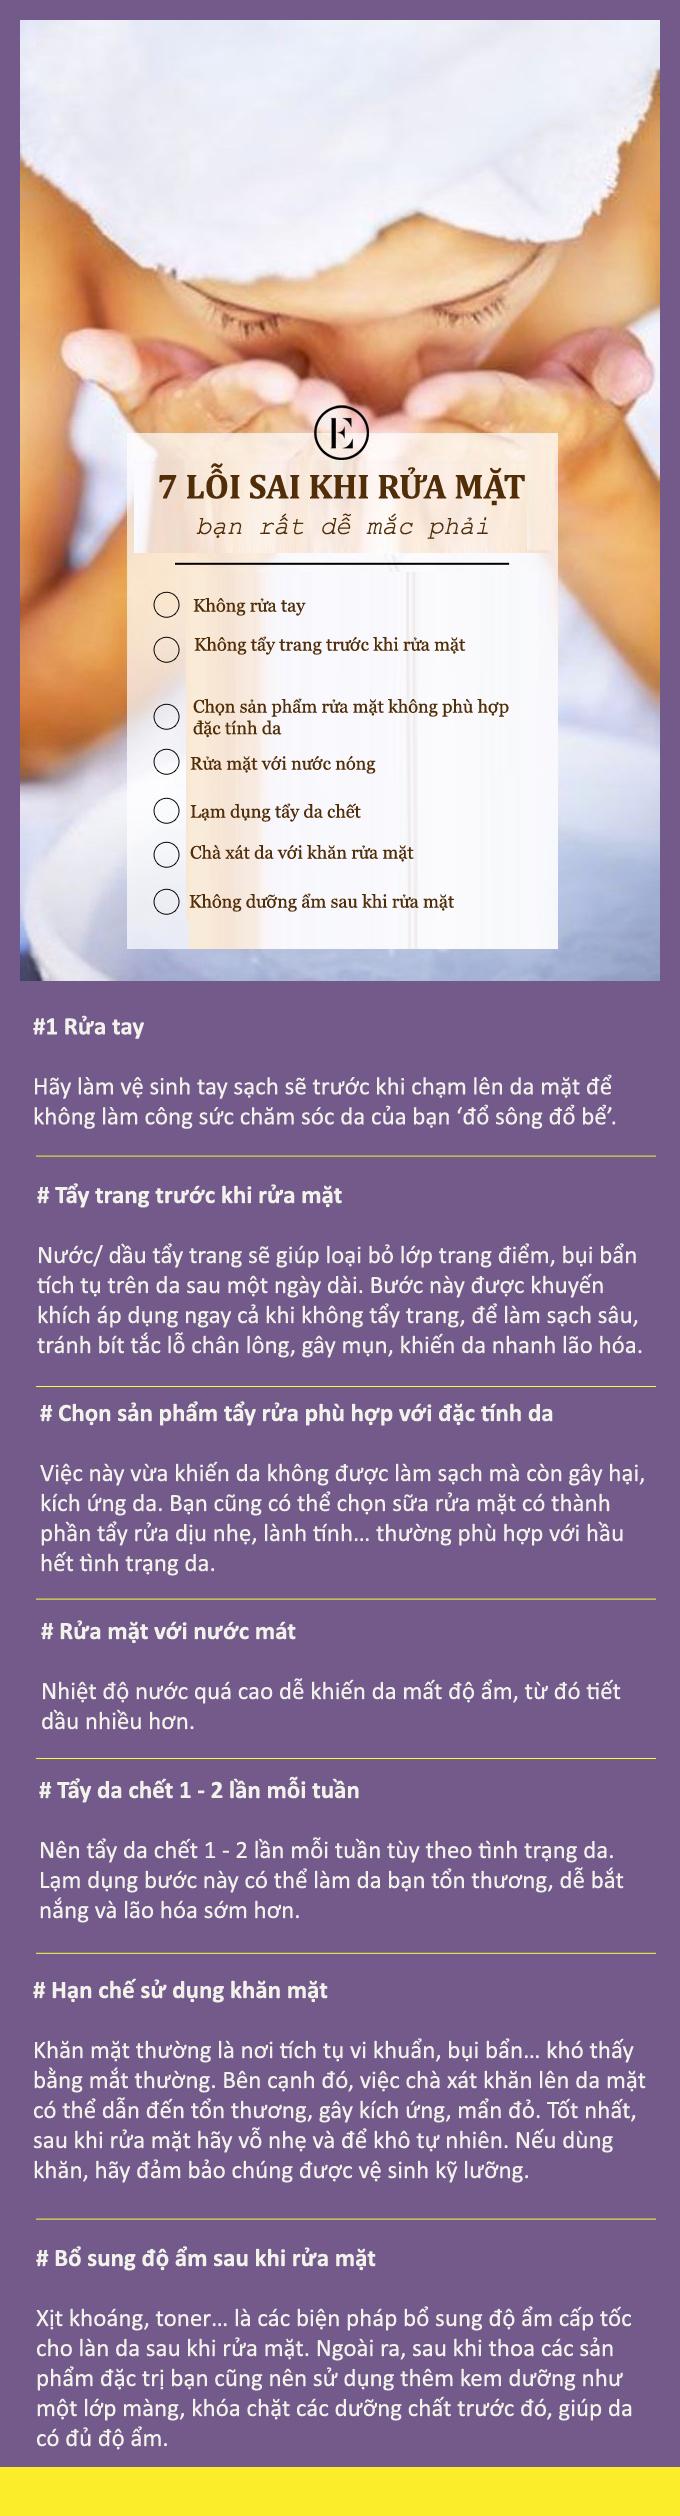 7 lỗi sai ai cũng có thể mắc phải khi rửa mặt